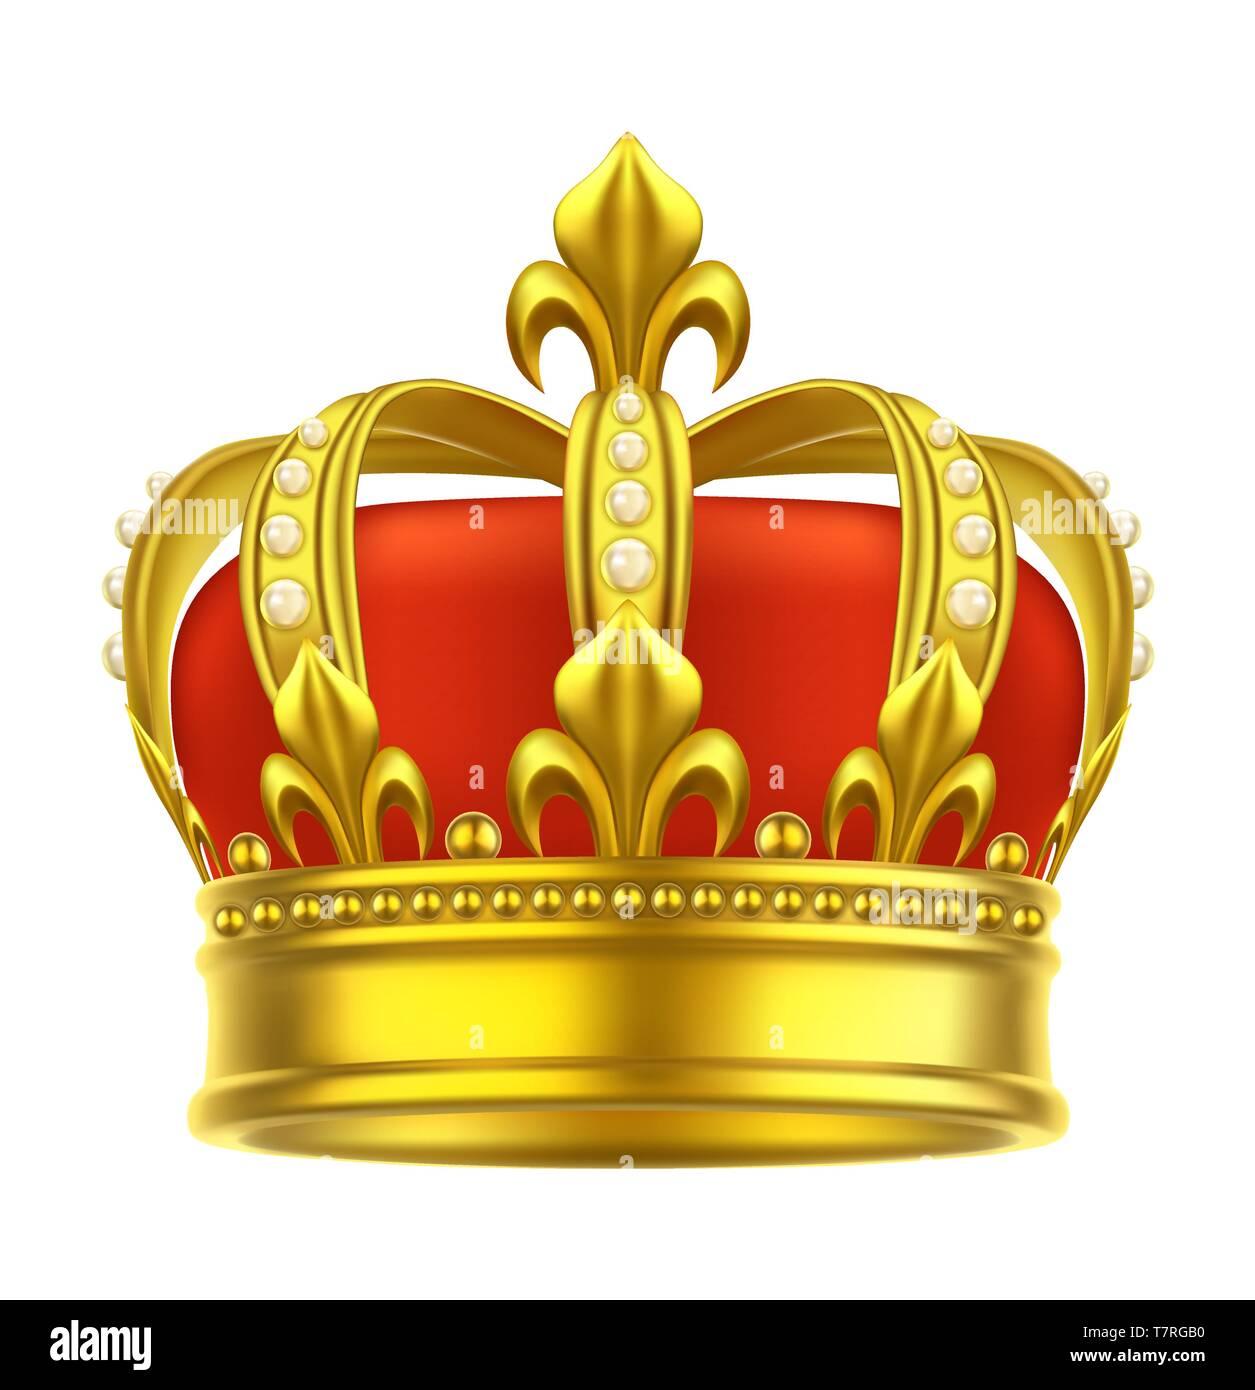 Heraldic crown icon. King, queen, game headdress - Stock Image